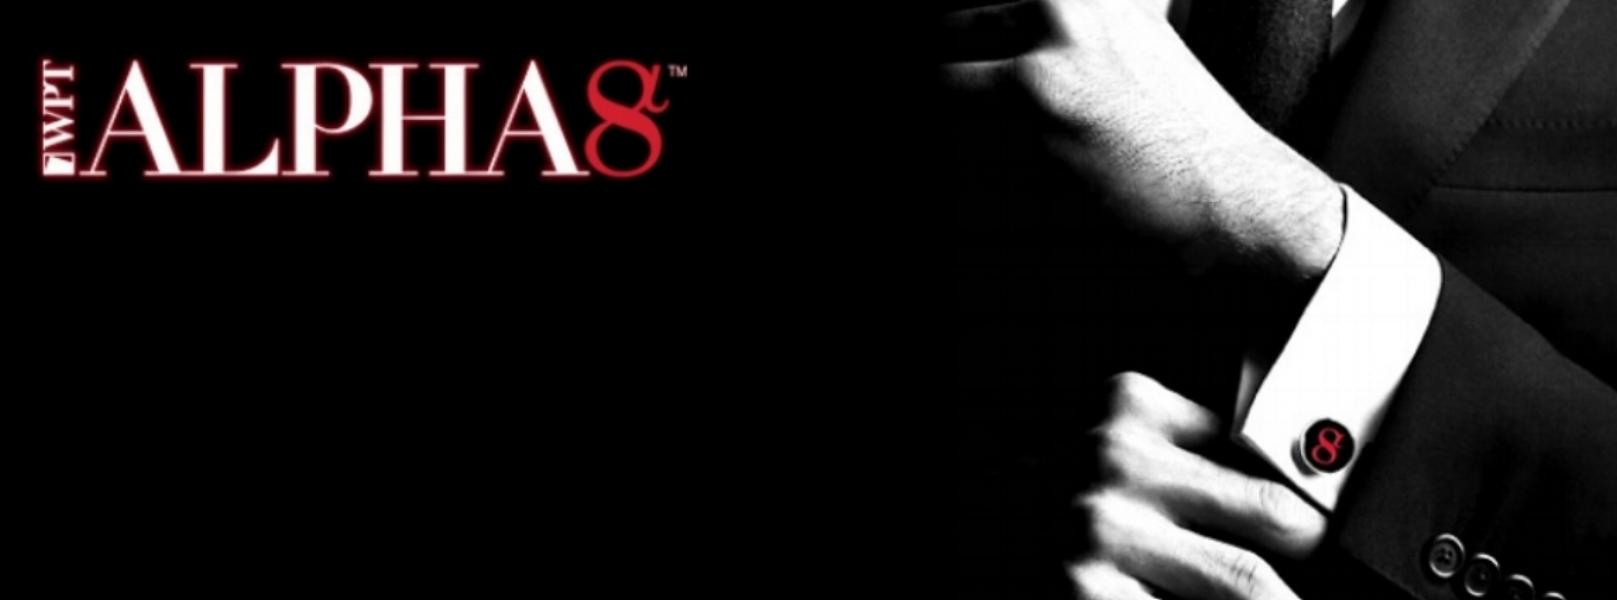 Alpha8-FacebookCoverIMG-850x315.jpg